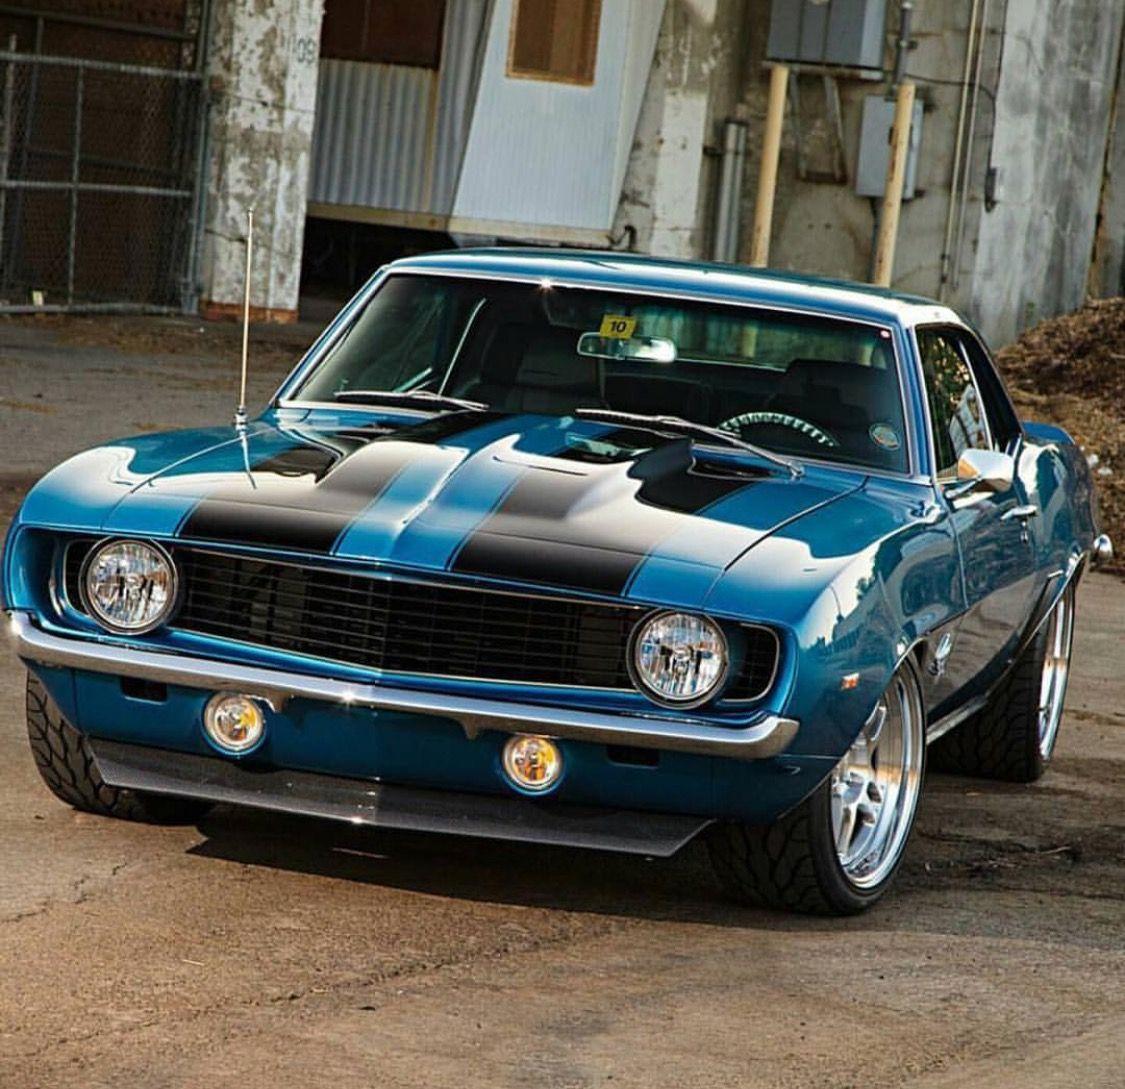 Custom Chevrolet Camaro 1969 | Chevrolet camaro 1969, Camaro